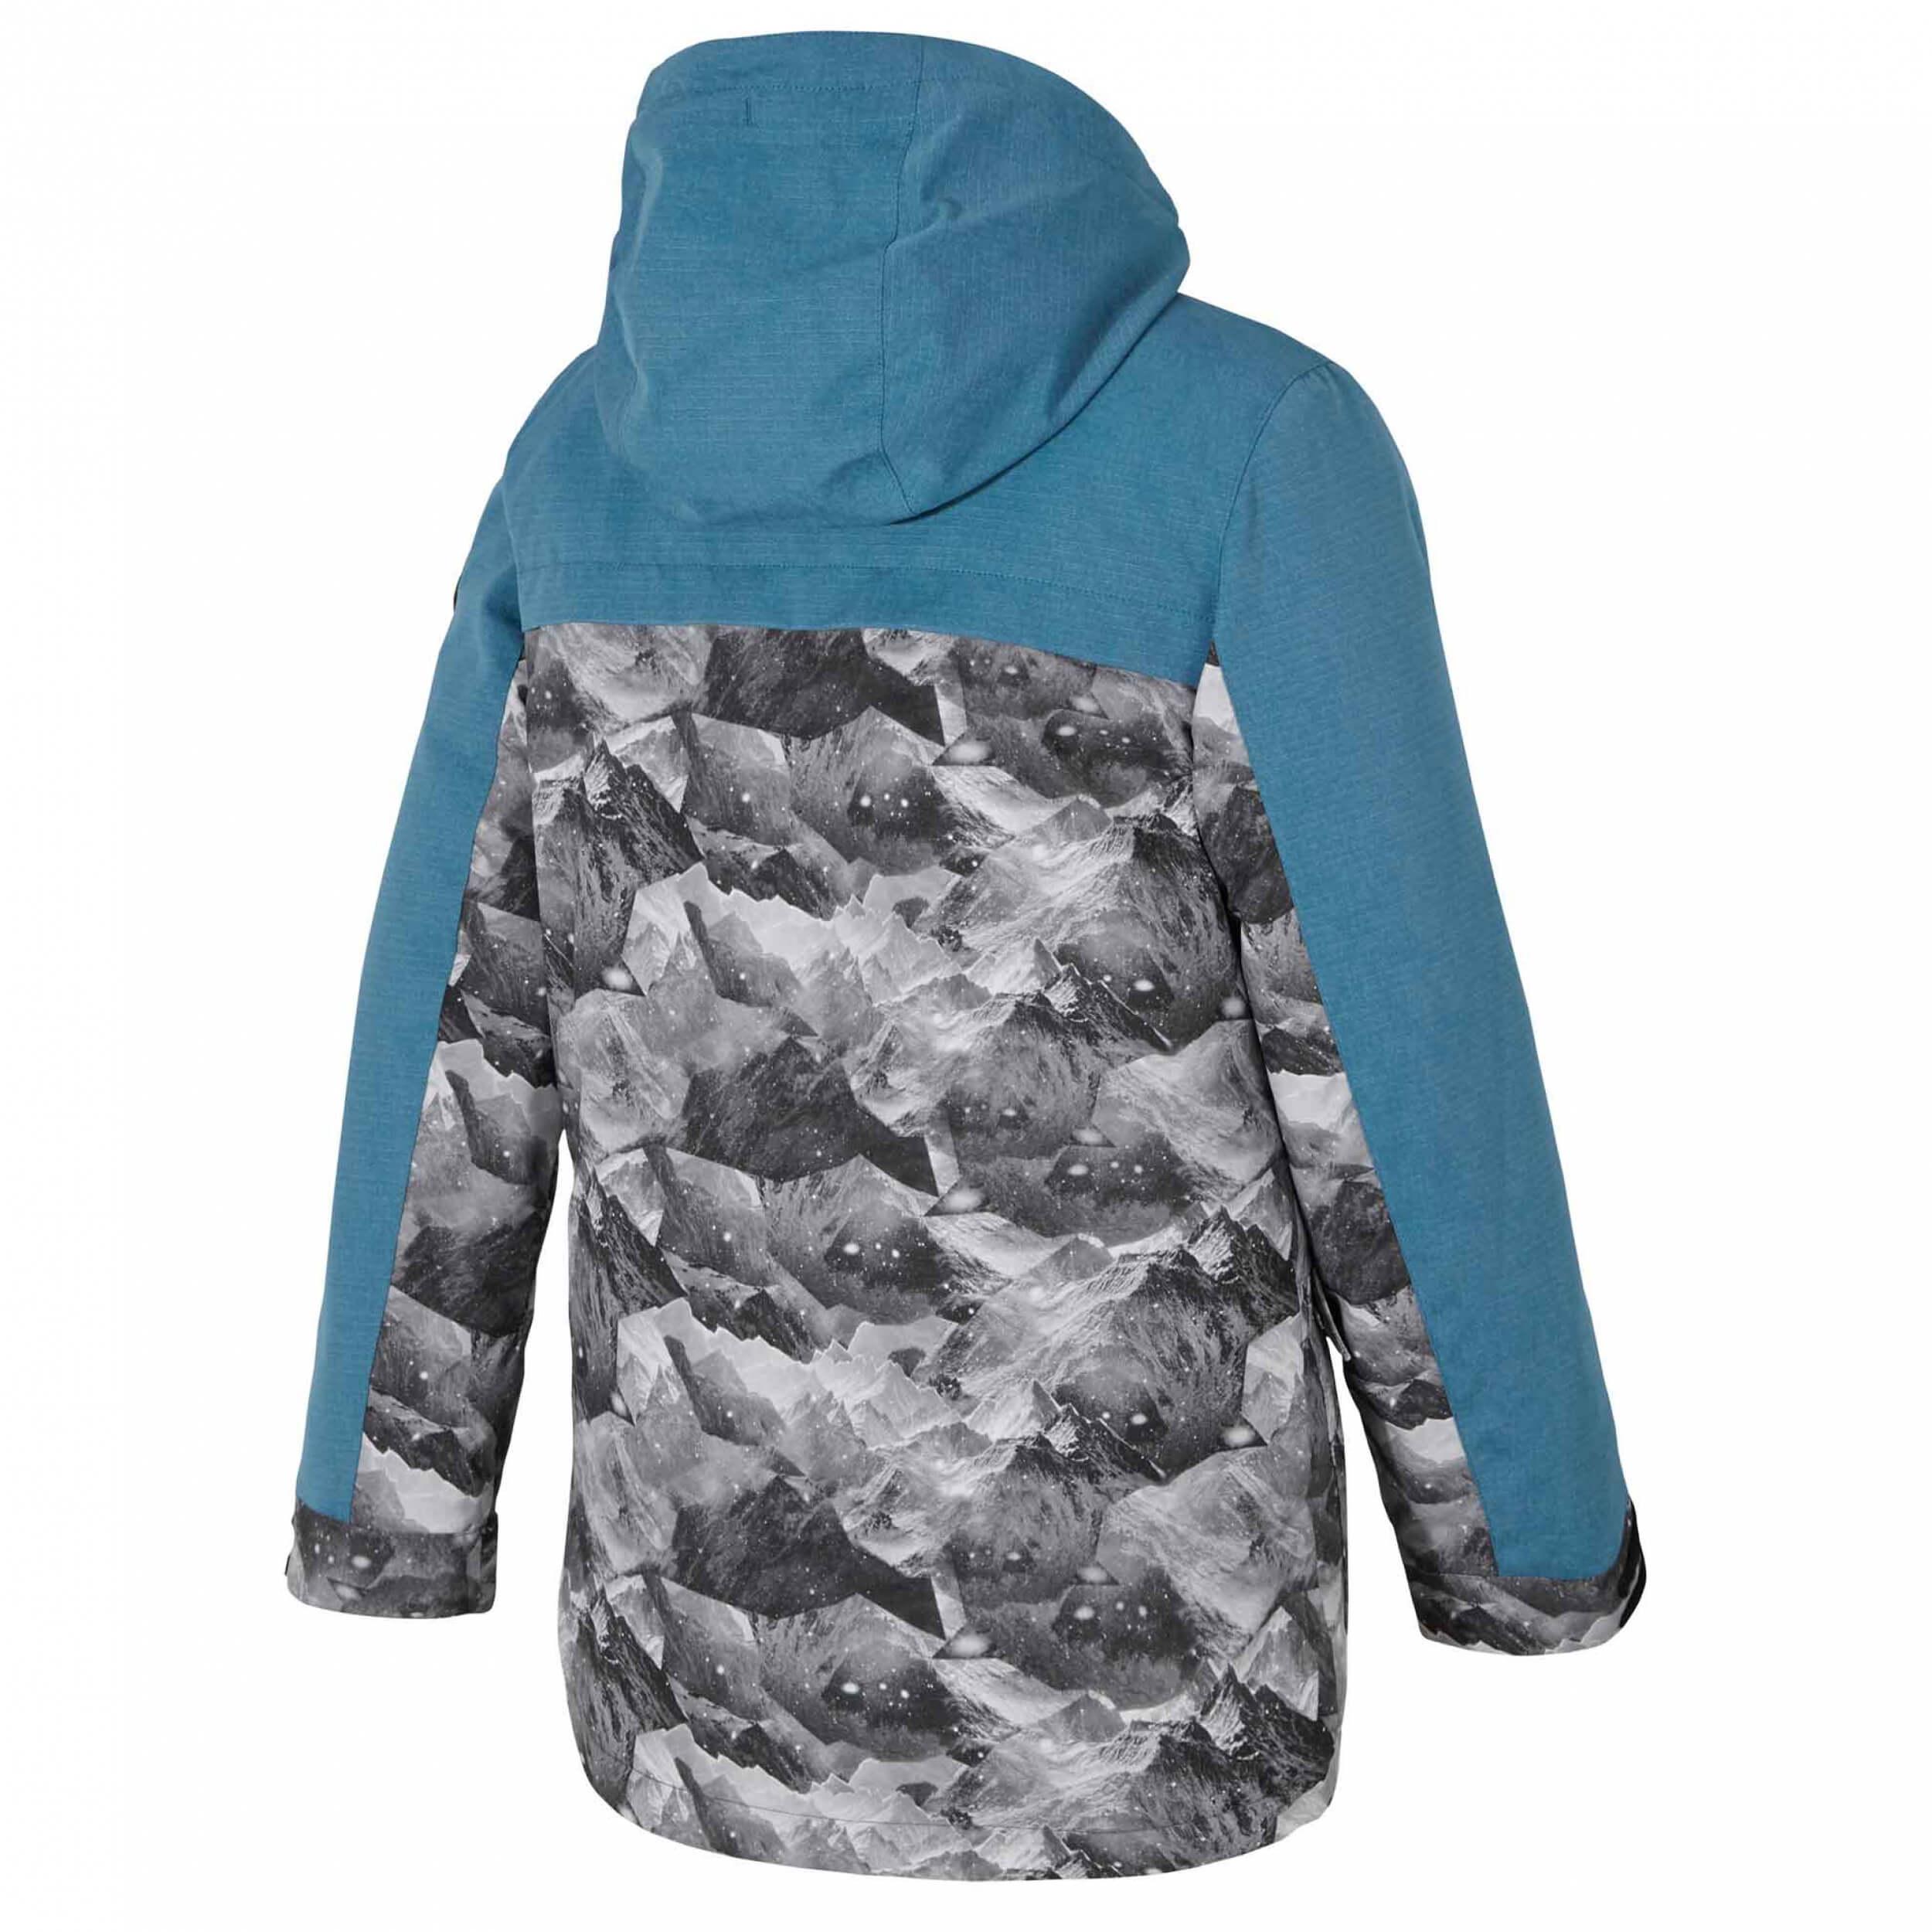 ZIENER Kinder Skijacke Alinus AQUASHIELD blau grau 891